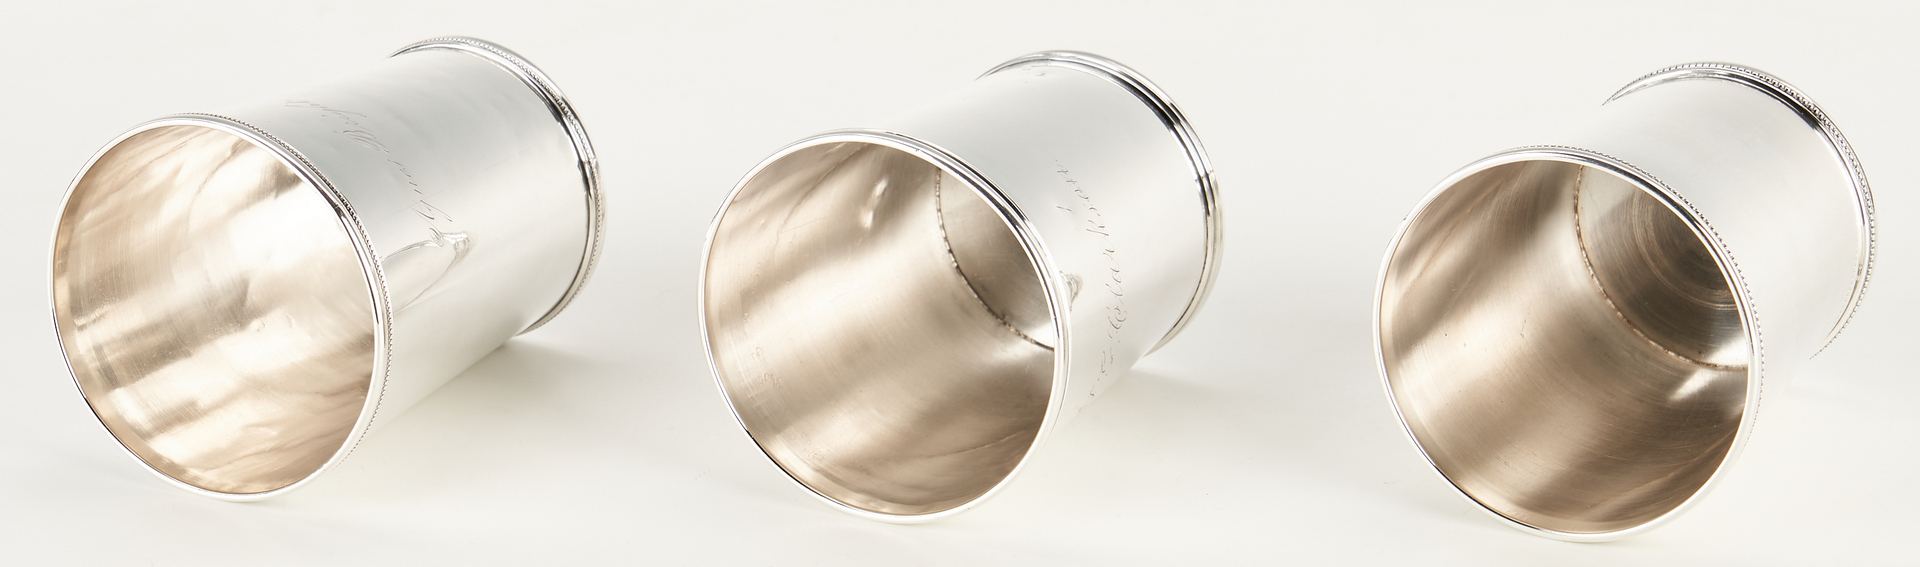 Lot 115: 3 KY Coin Silver Julep Cups, G. Sharp, Danville